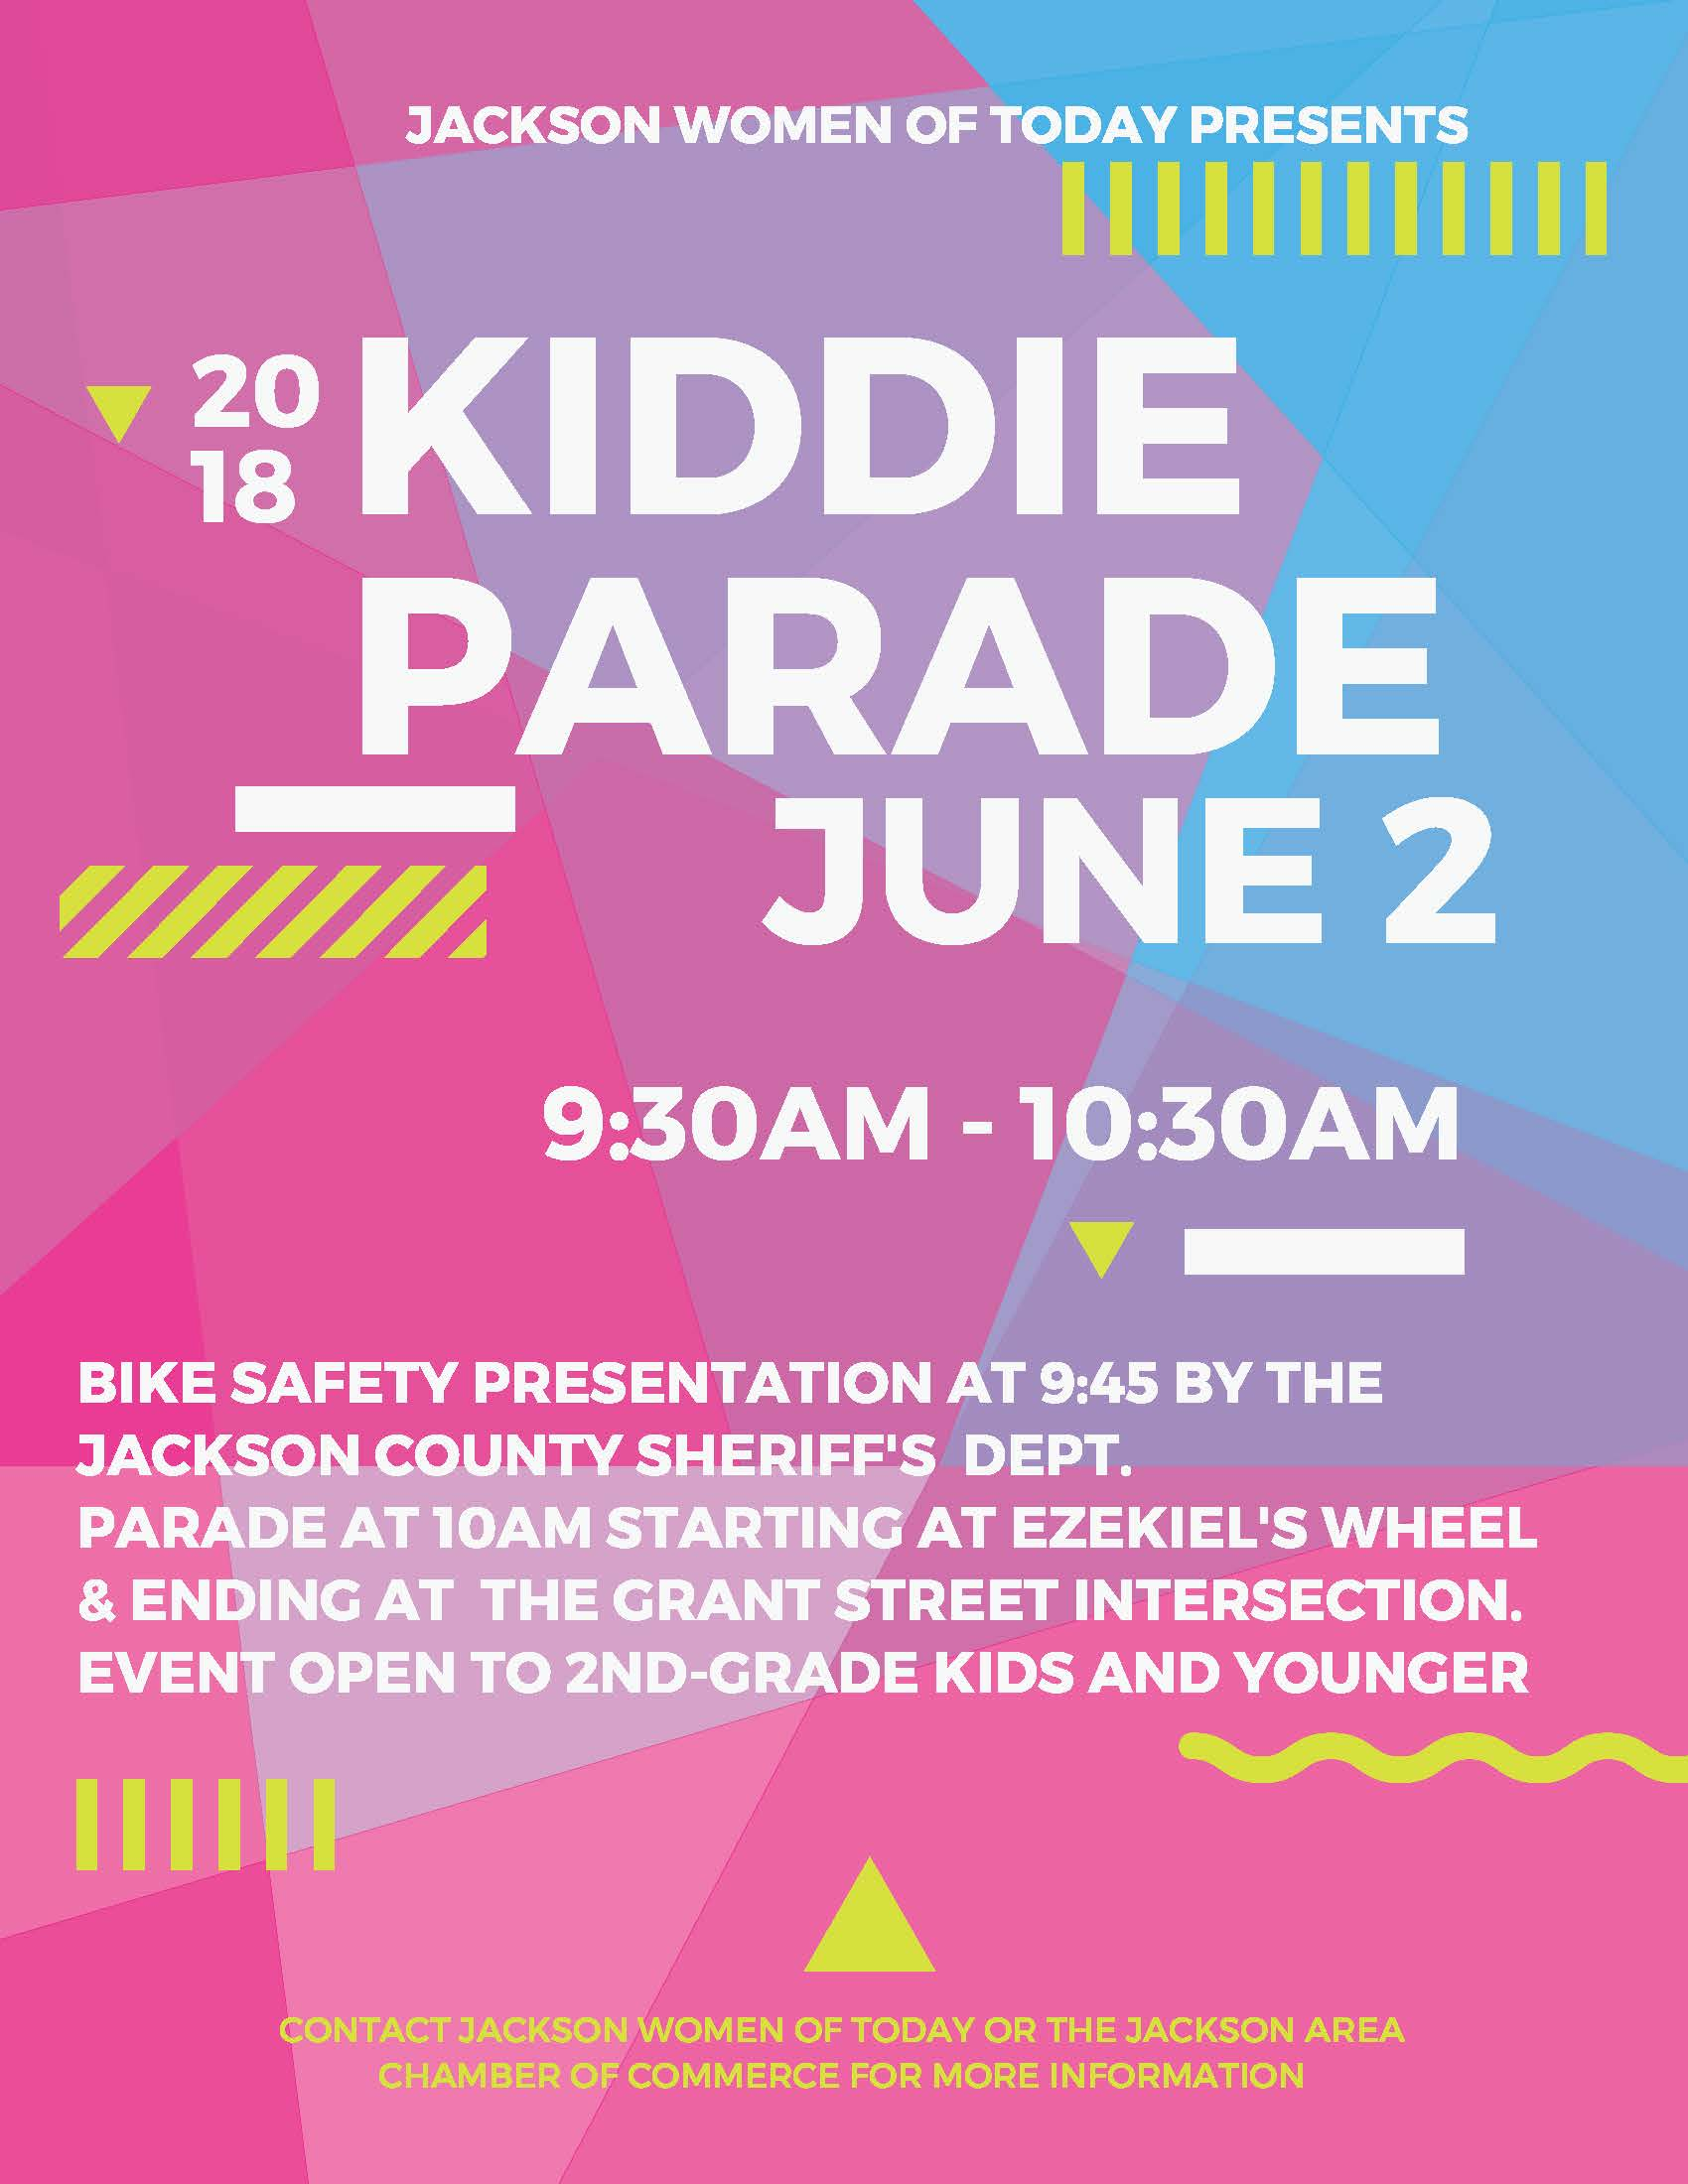 Kiddie-Parade-Flyer.jpg